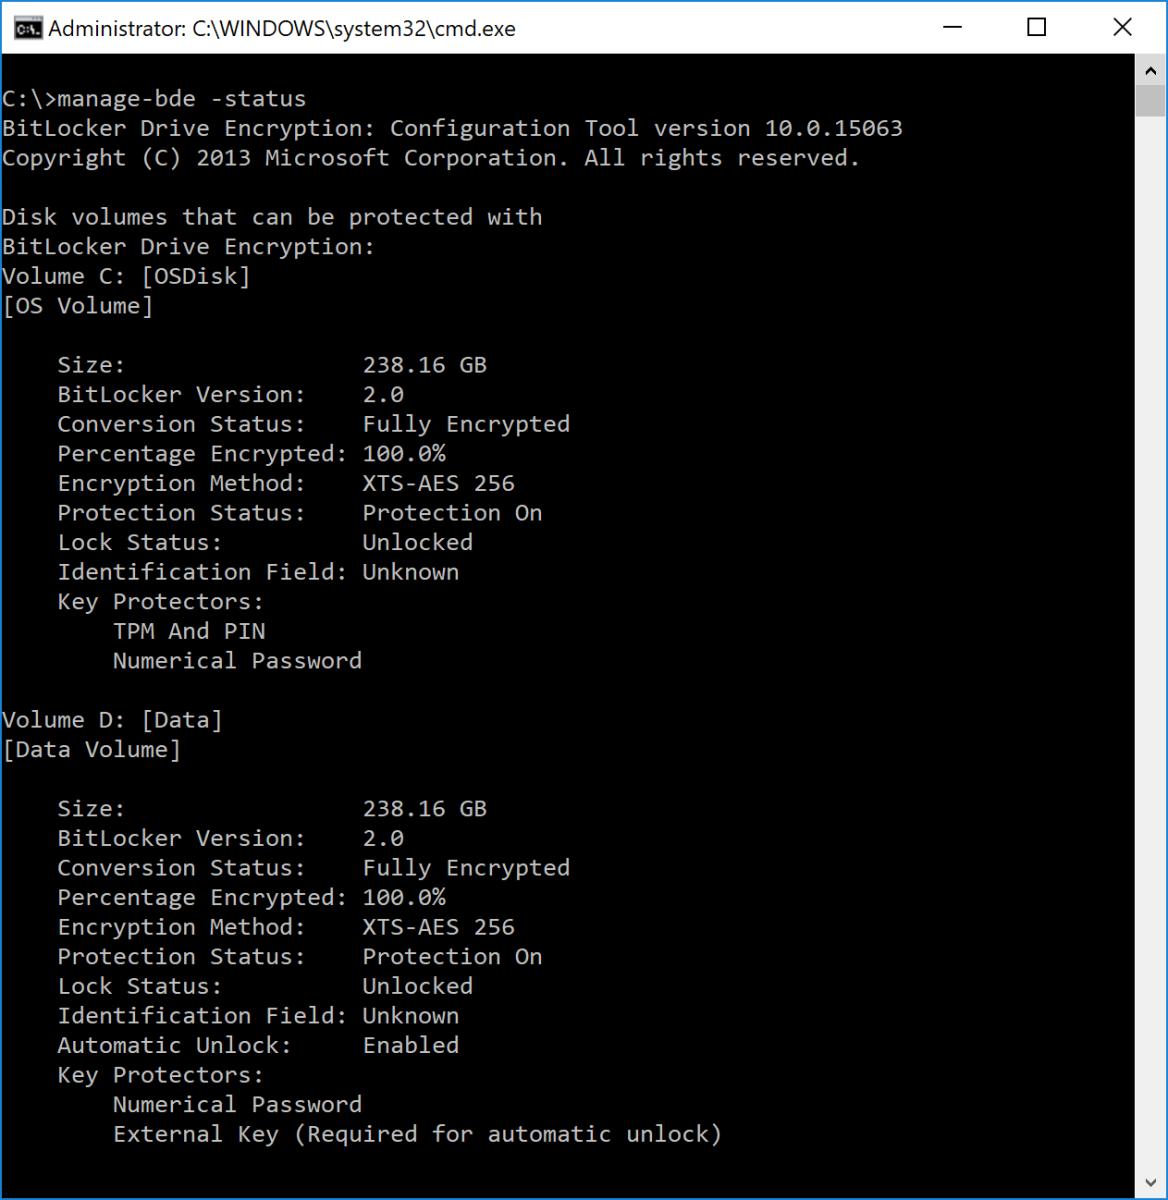 Windows 10 OSD: Enabling BitLocker XTS-AES 256 on Multiple Drives